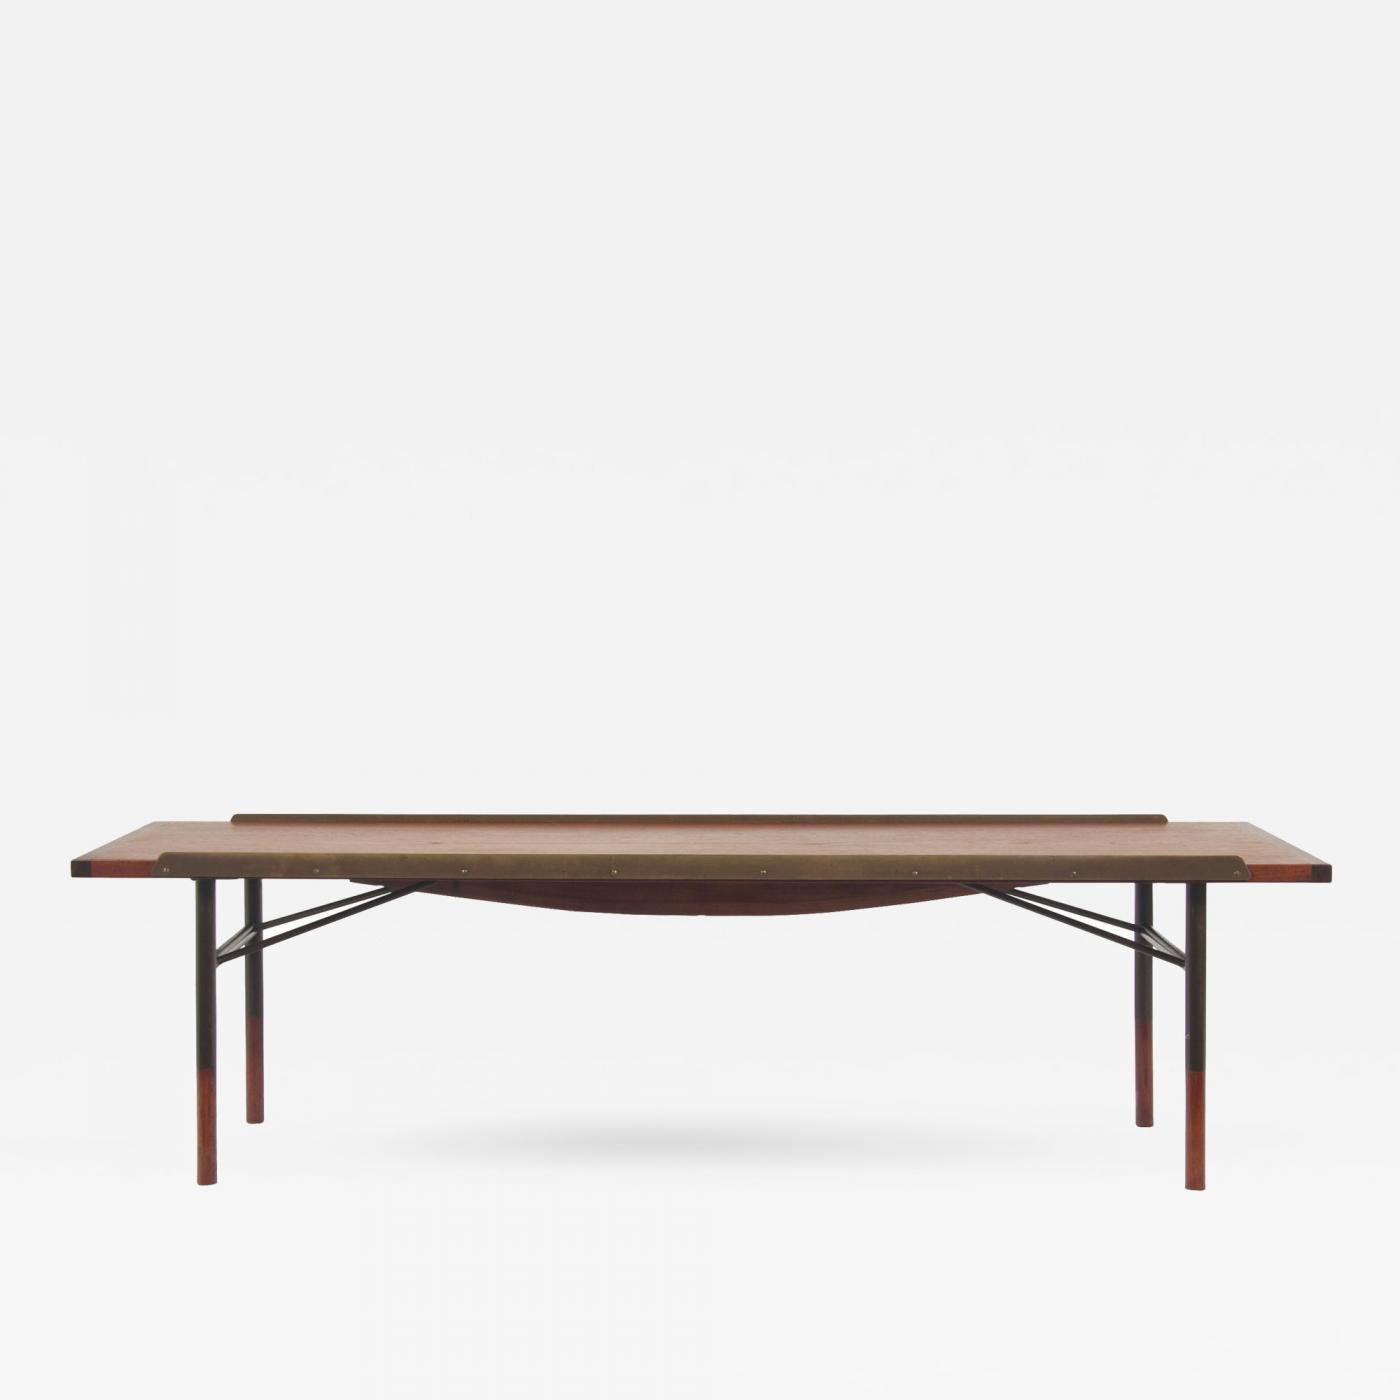 Awe Inspiring Finn Juhl Finn Juhl Architectural Table Bench Pabps2019 Chair Design Images Pabps2019Com